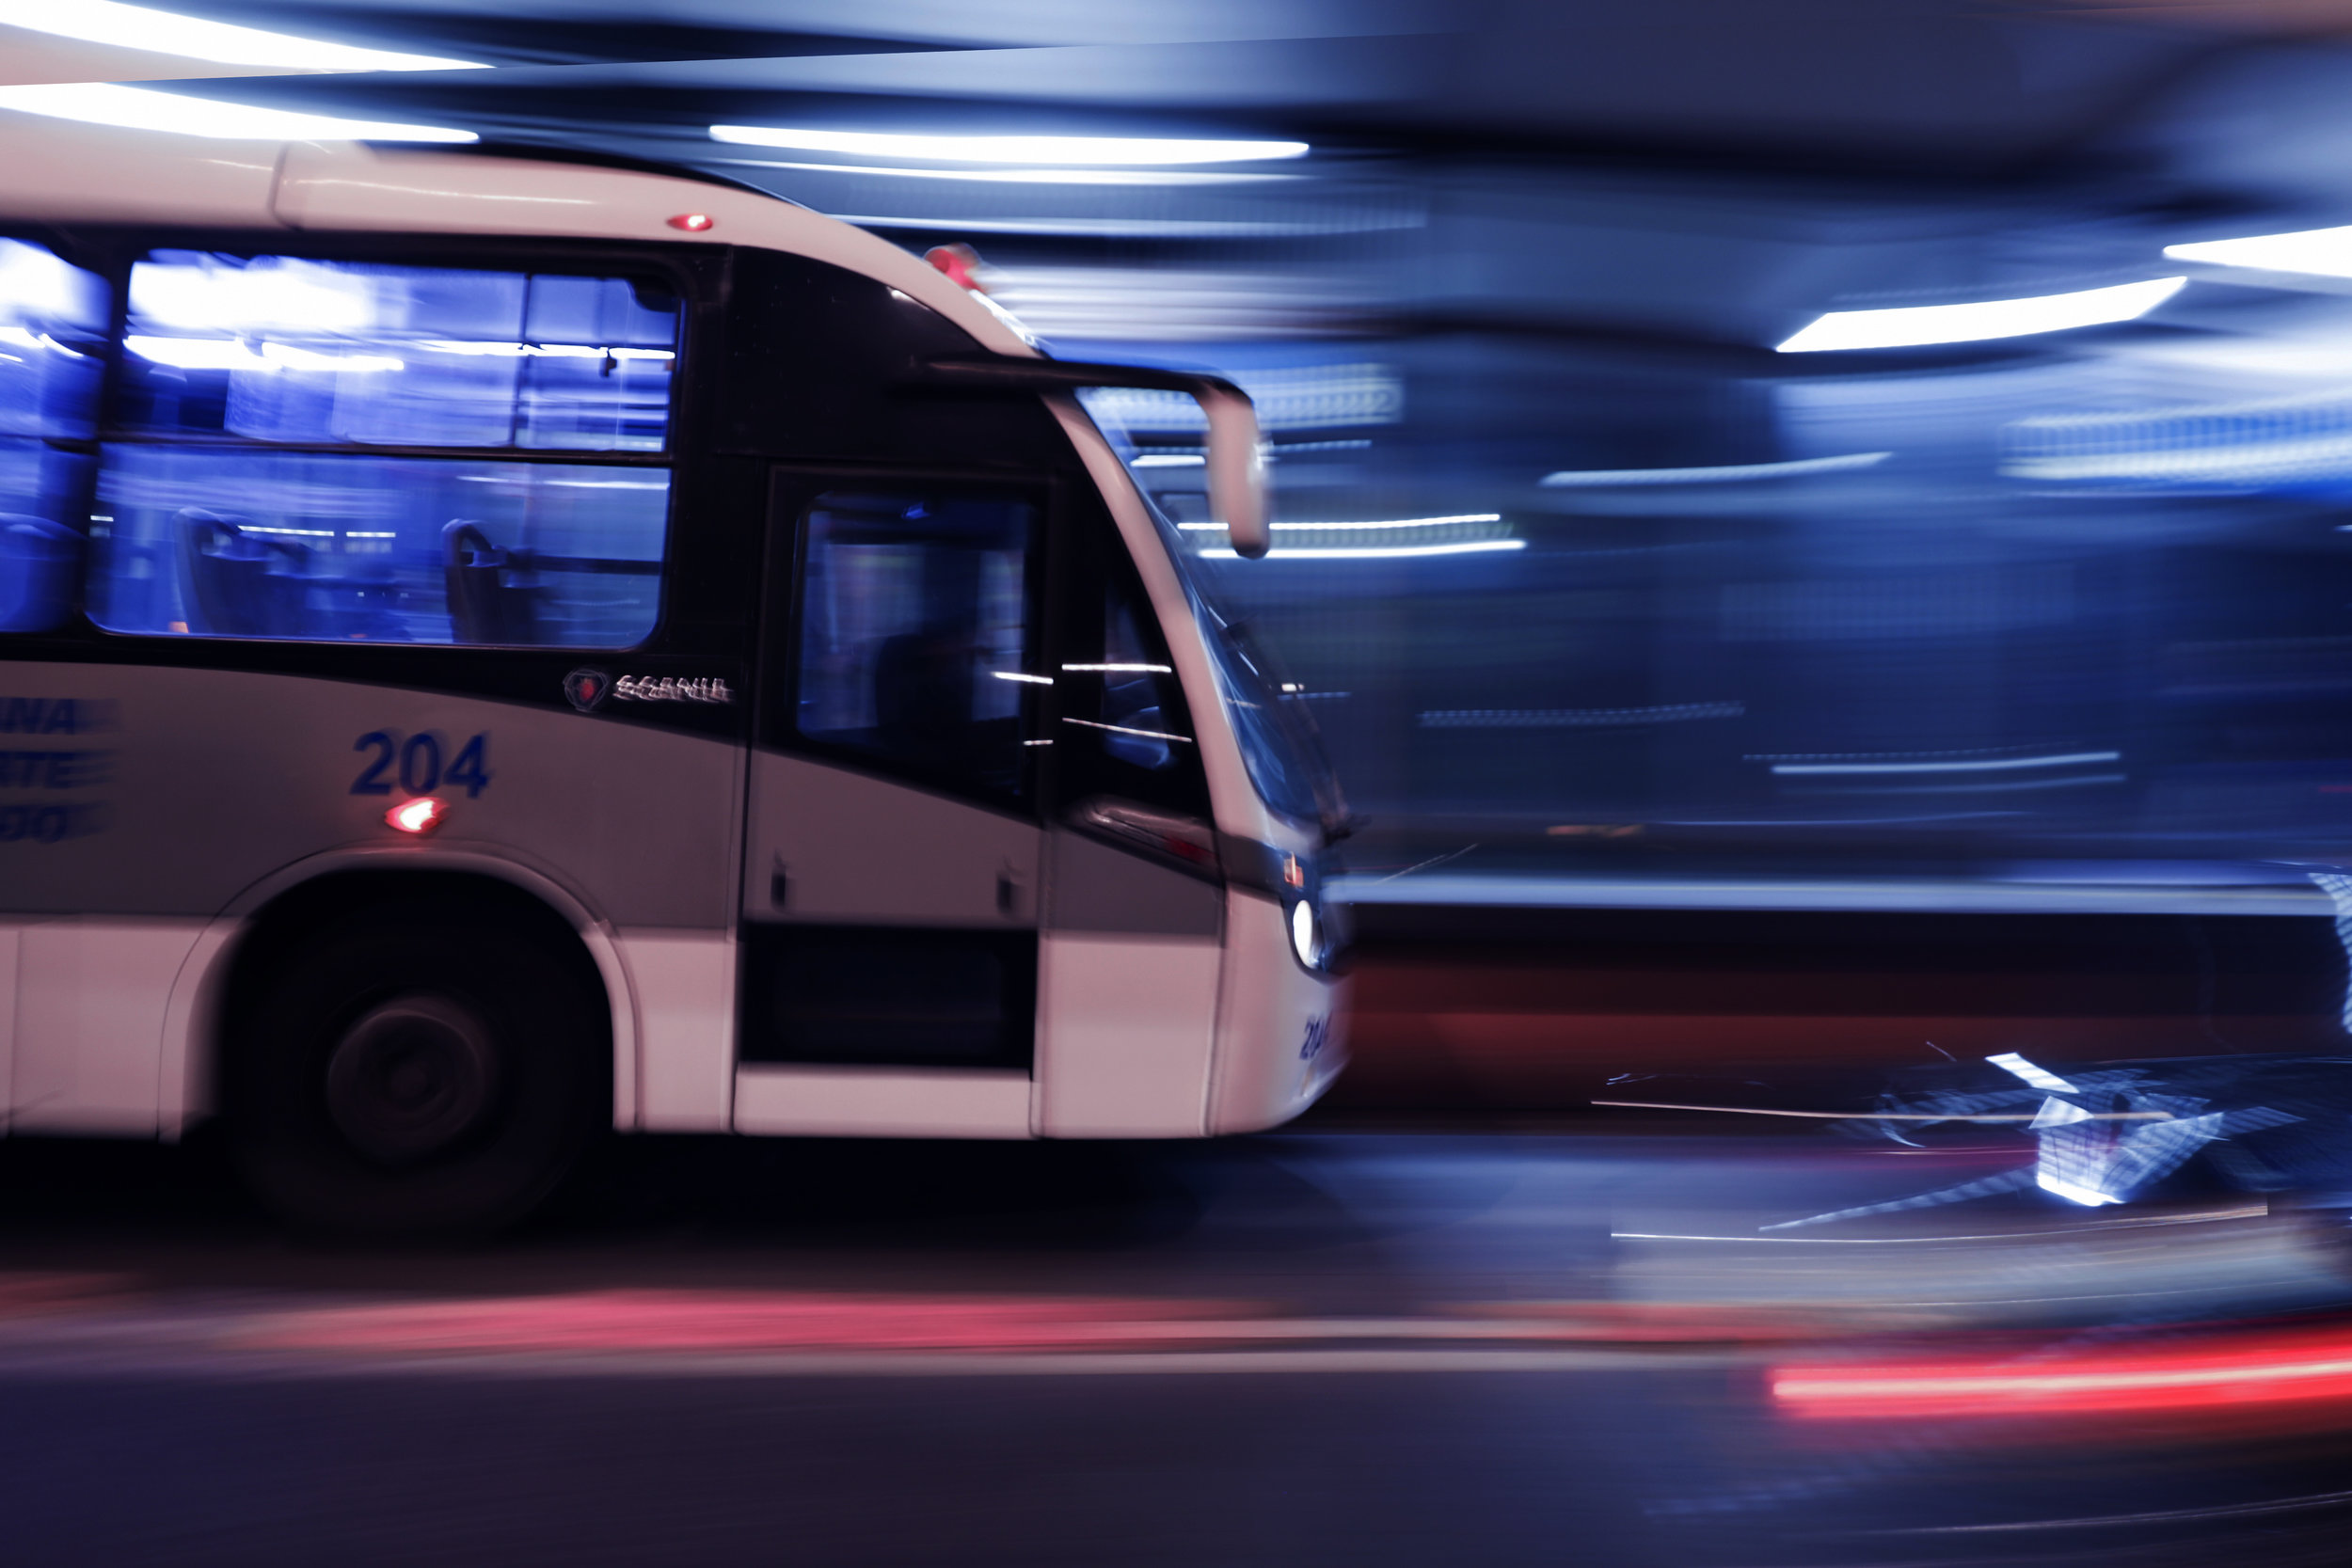 autobus-mobilityado.jpg